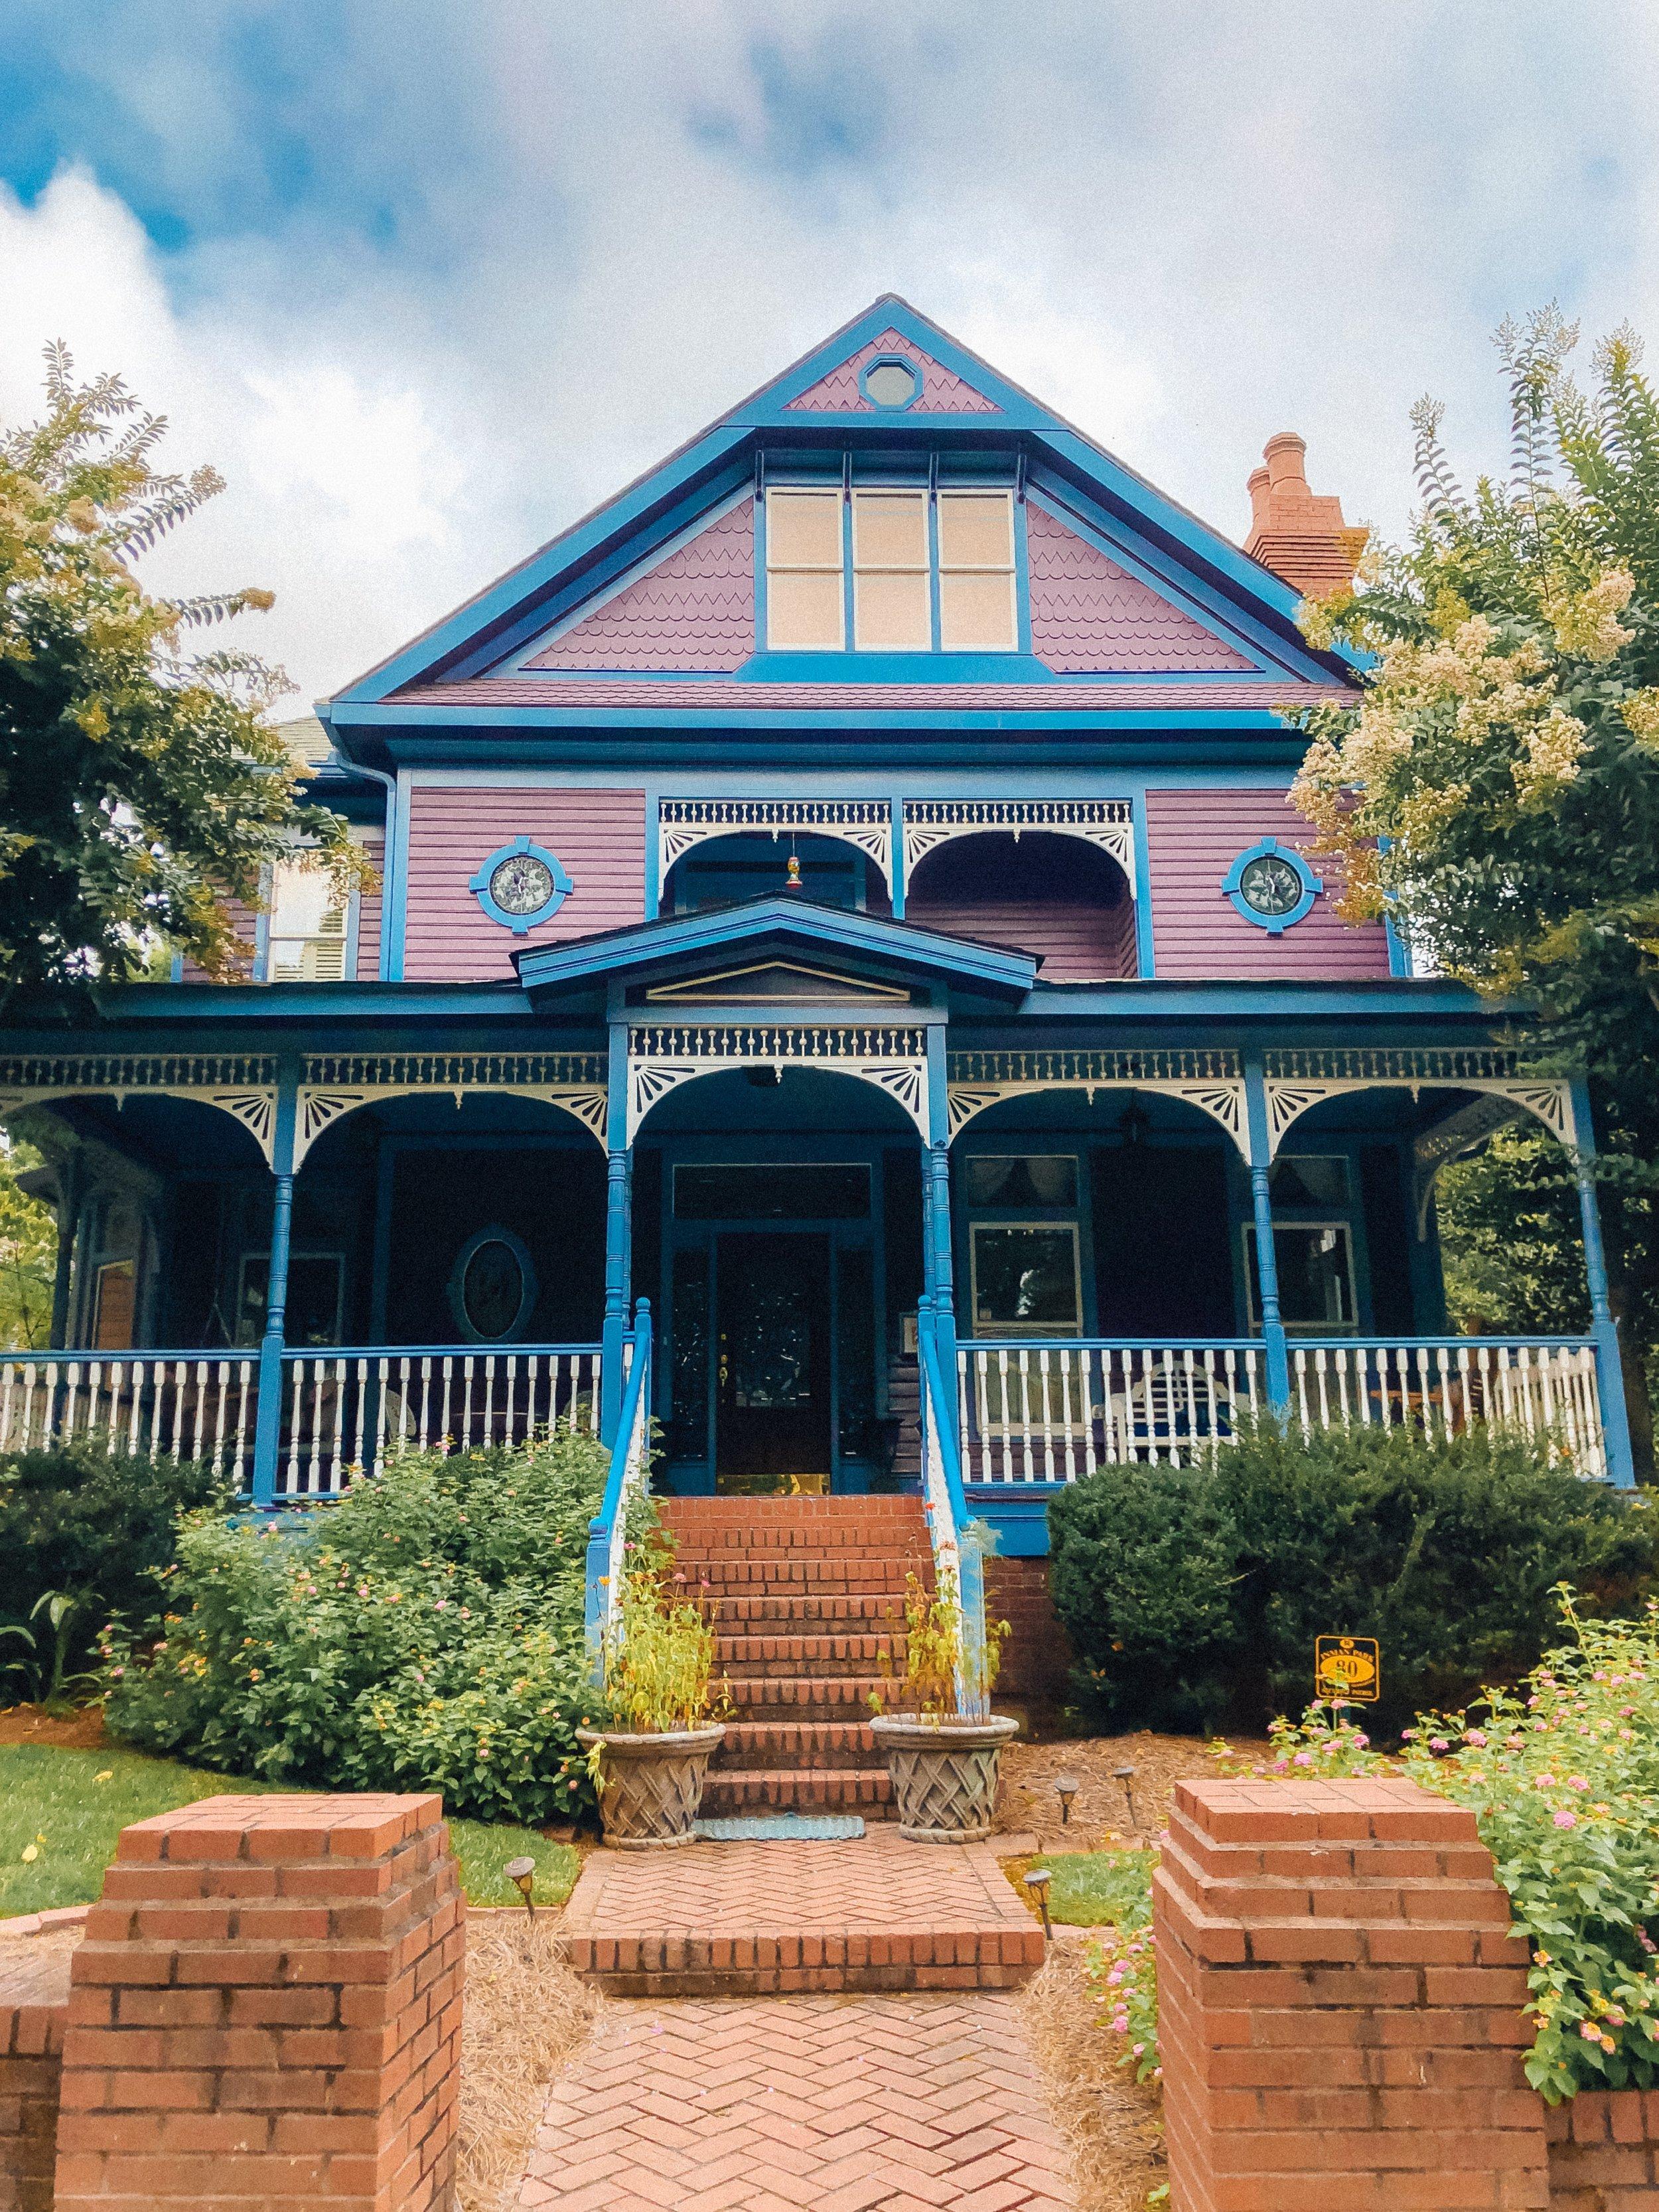 Inman Park | Where to Stay in Atlanta | Jordan Hefler